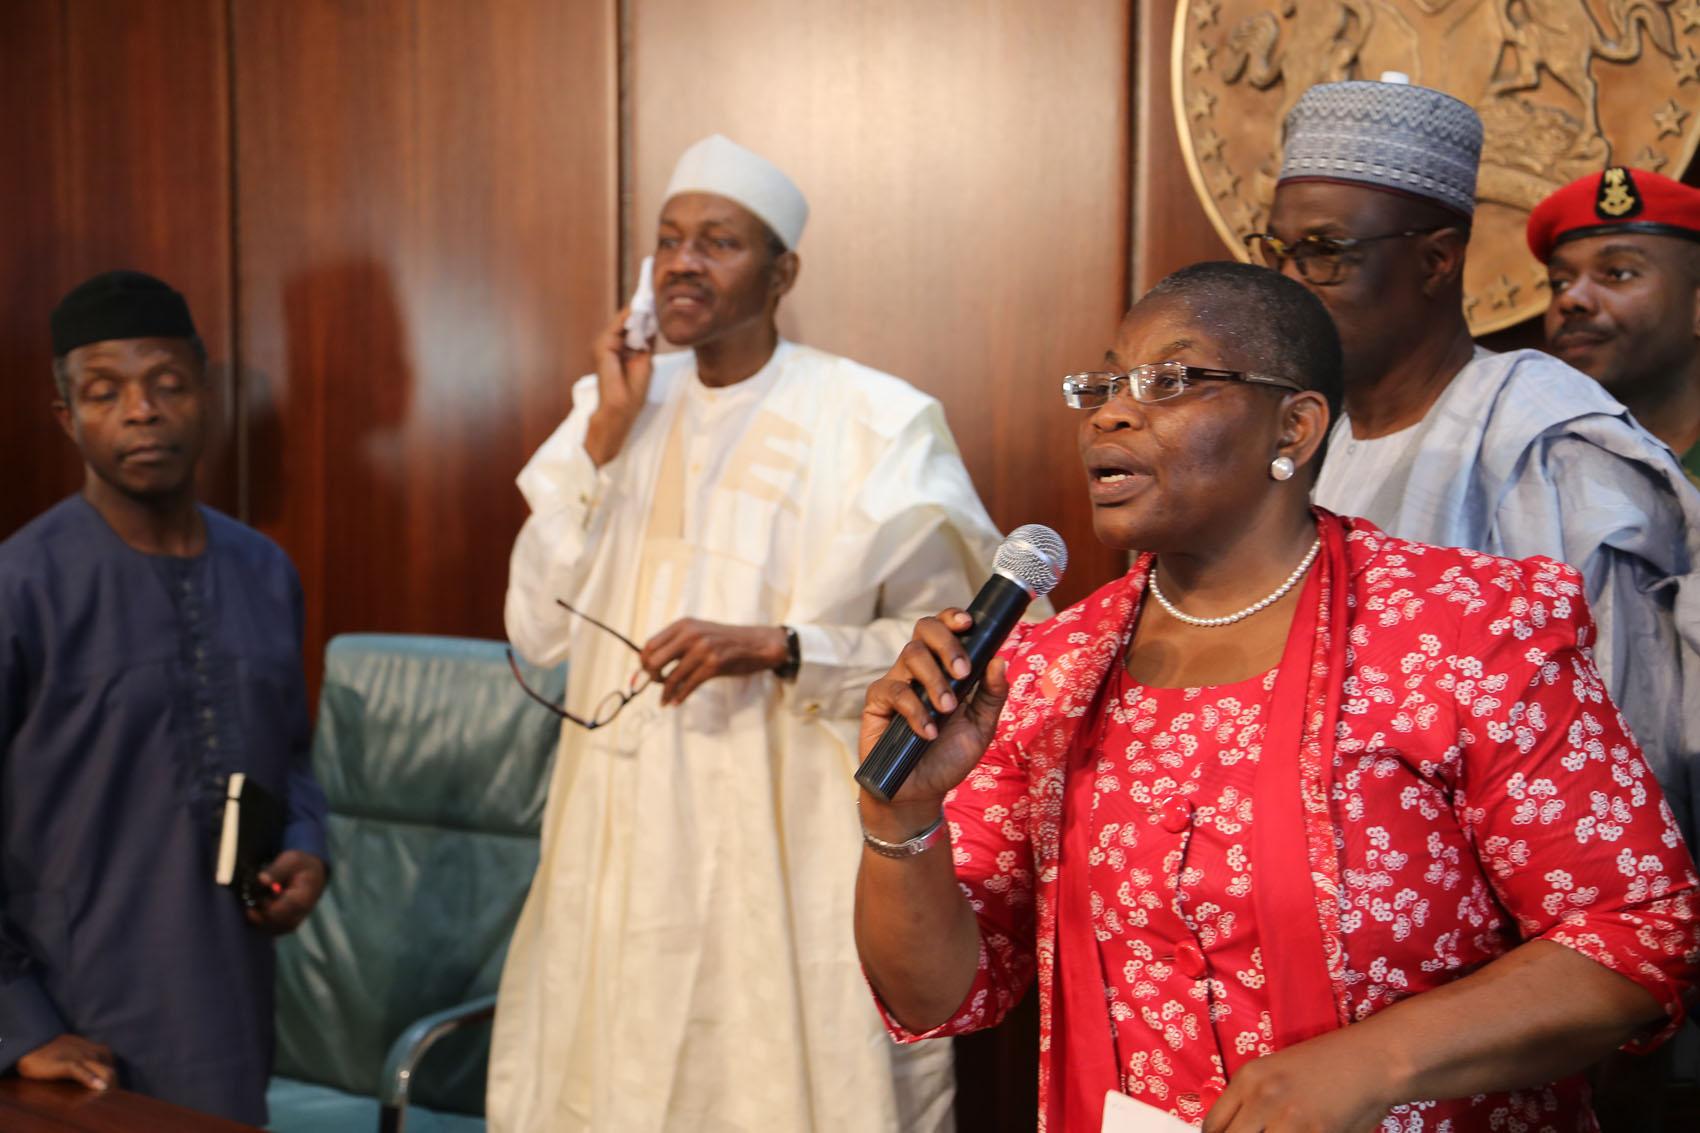 Stop Been A Sectional Leader - Ezekwesili Tells Buhari